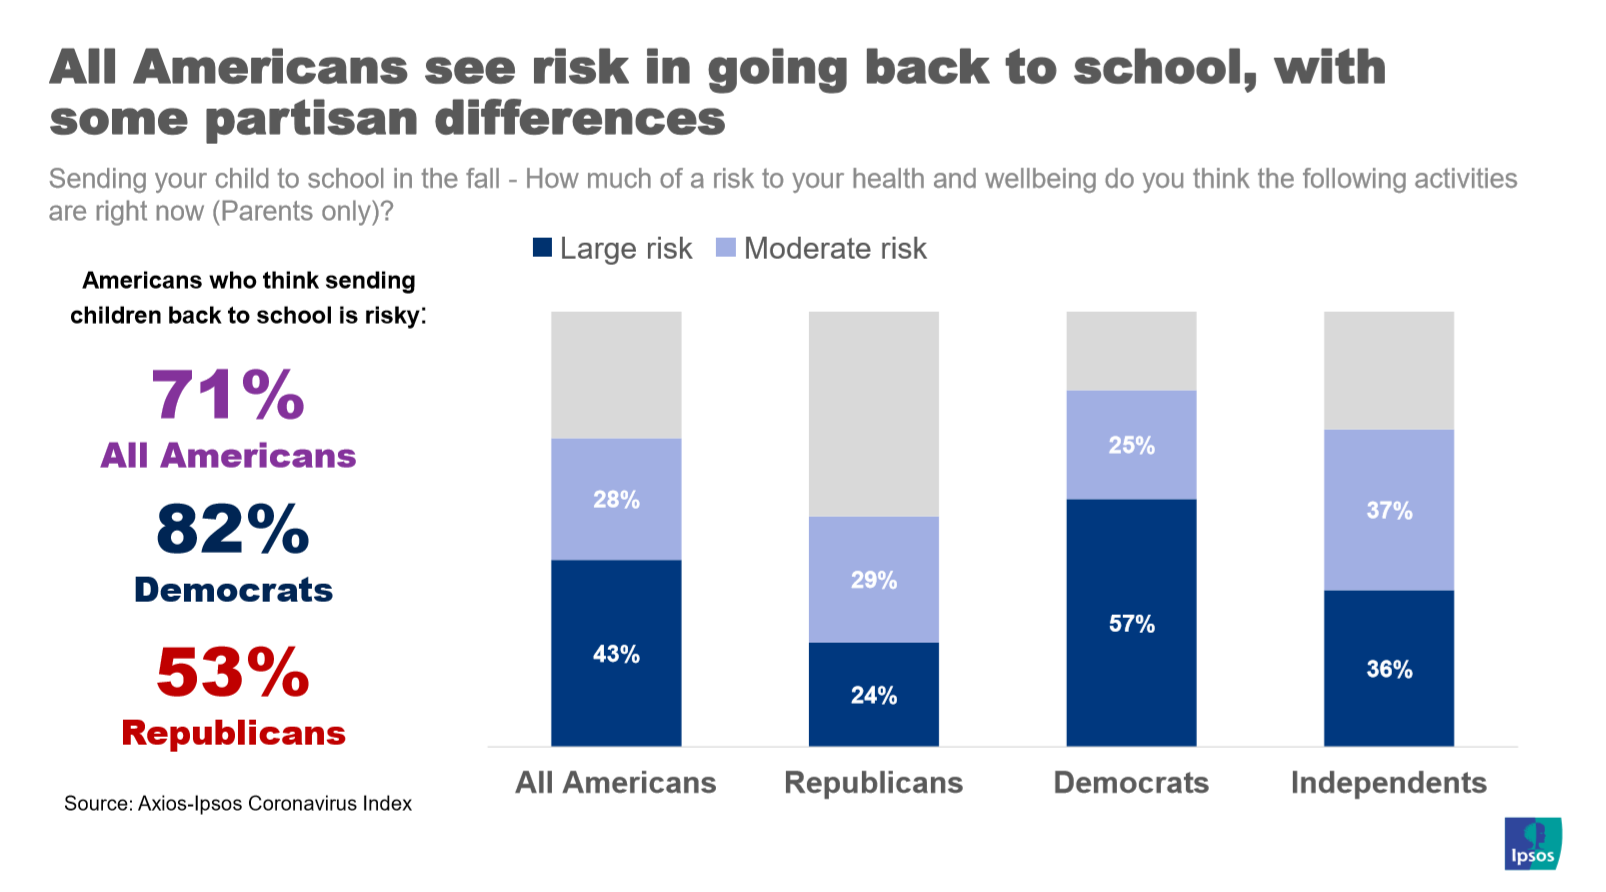 Perceived risk of sending kids back to school